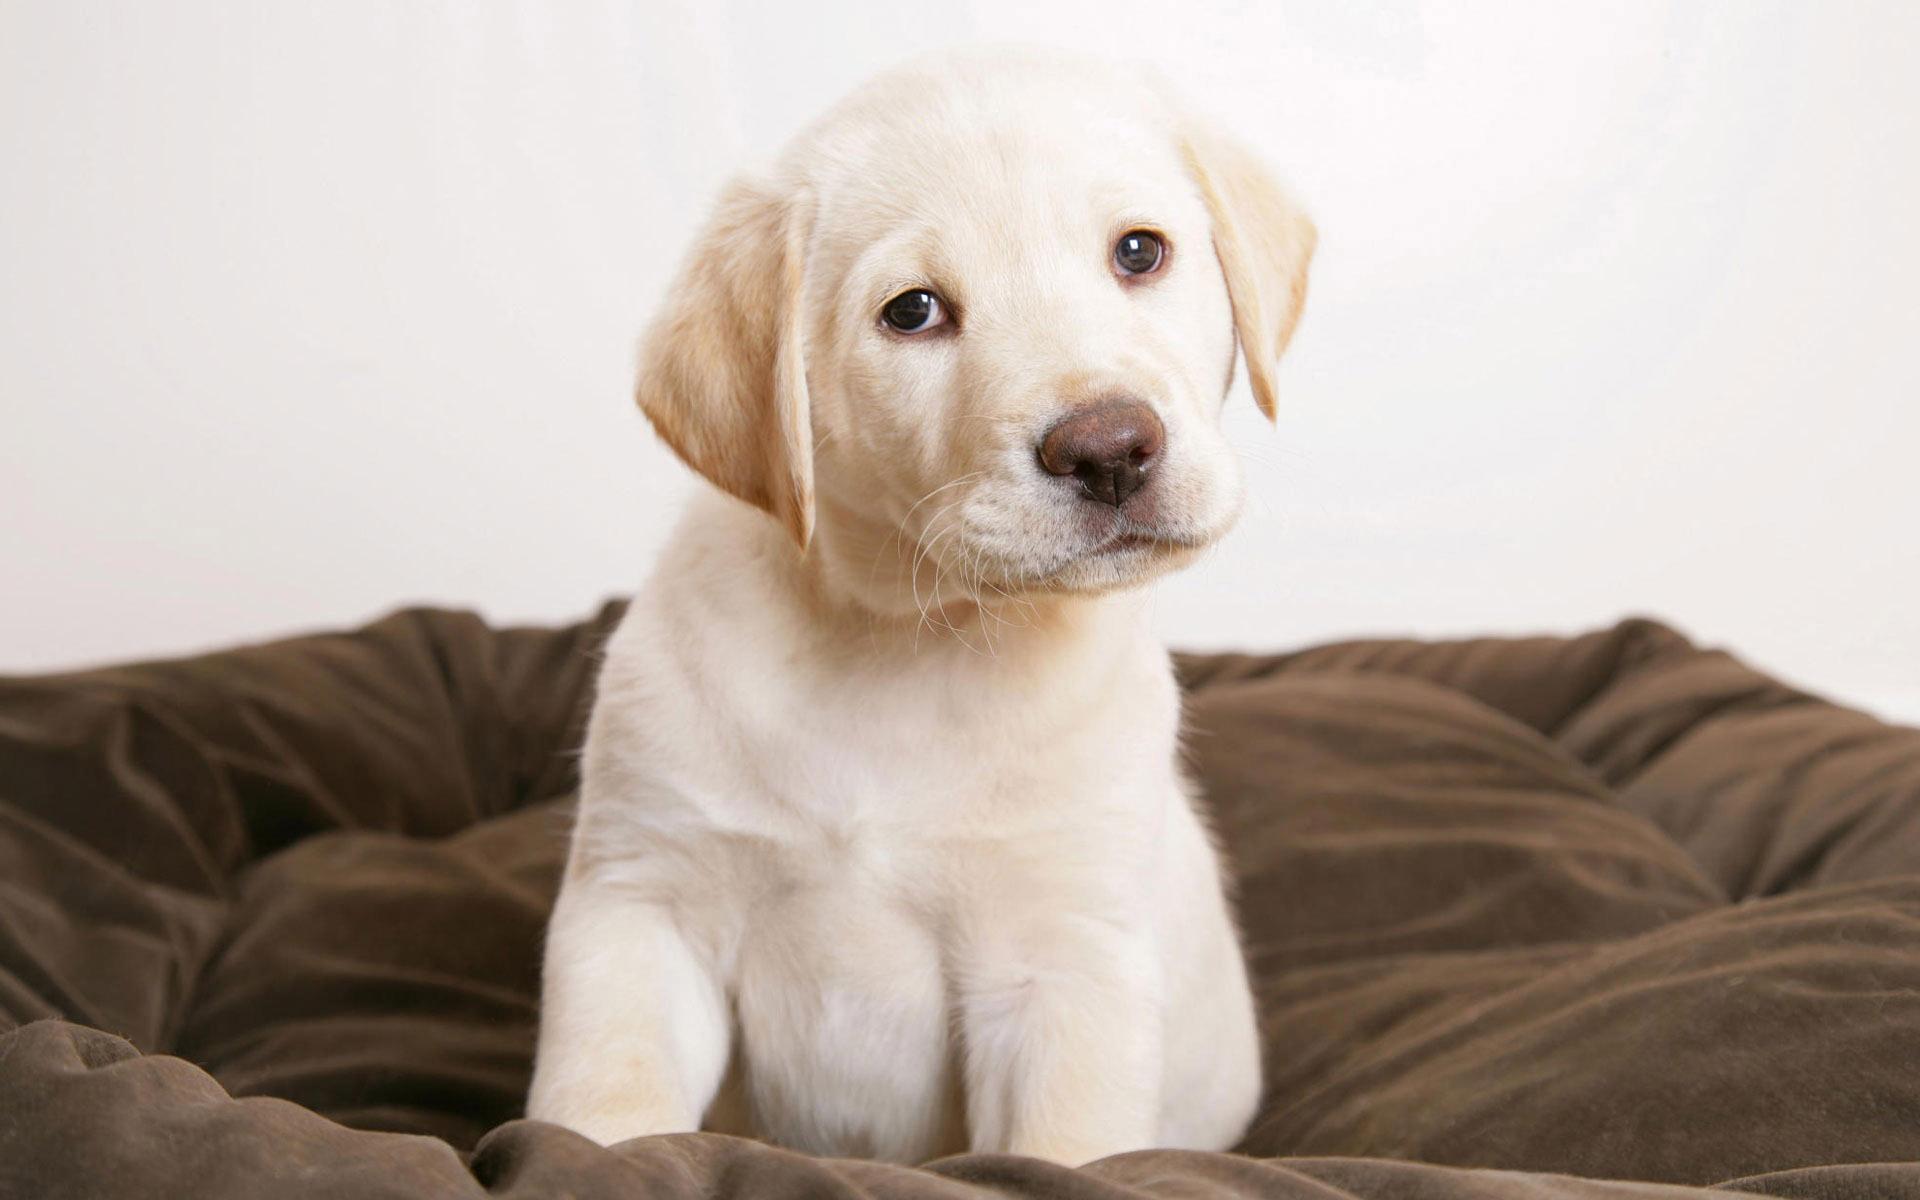 Cute Labrador Puppy Wallpaper 1920x1200 12464